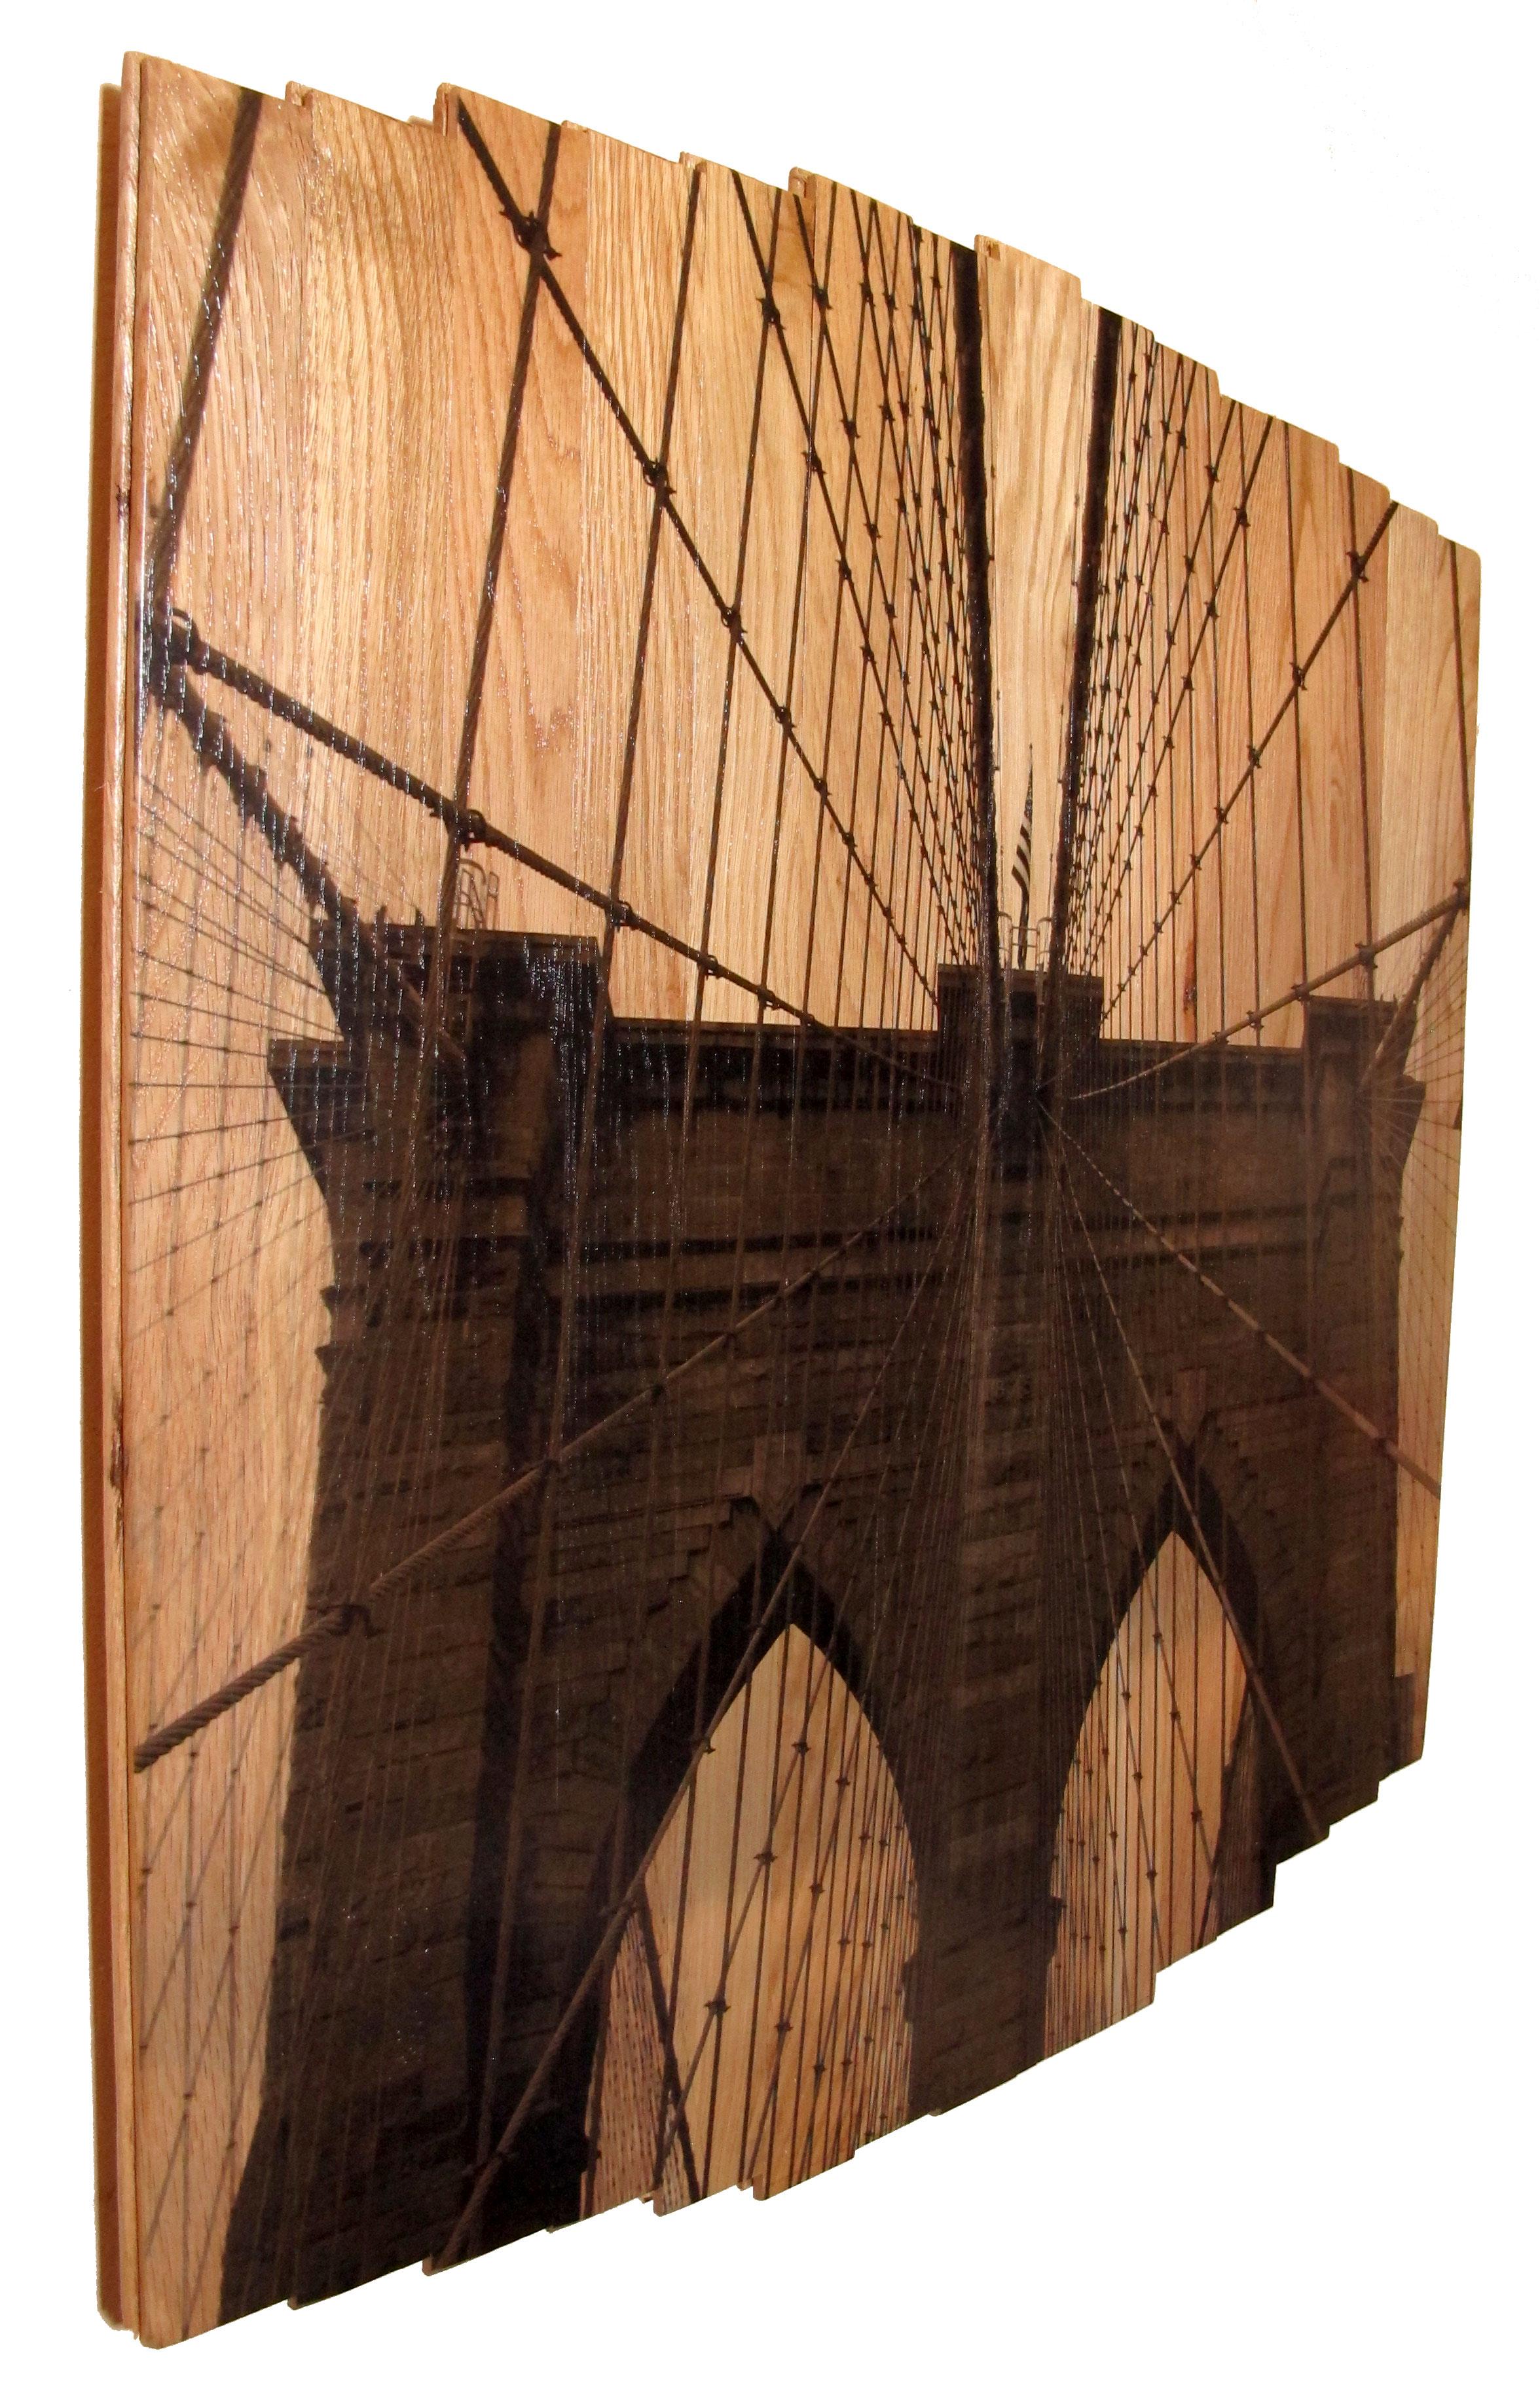 Brooklyn Bridge I,  2016 c print on reclaimed wood floor 34 x 34 x 1.5 in / 86 x 86 x 4 cm  Unique